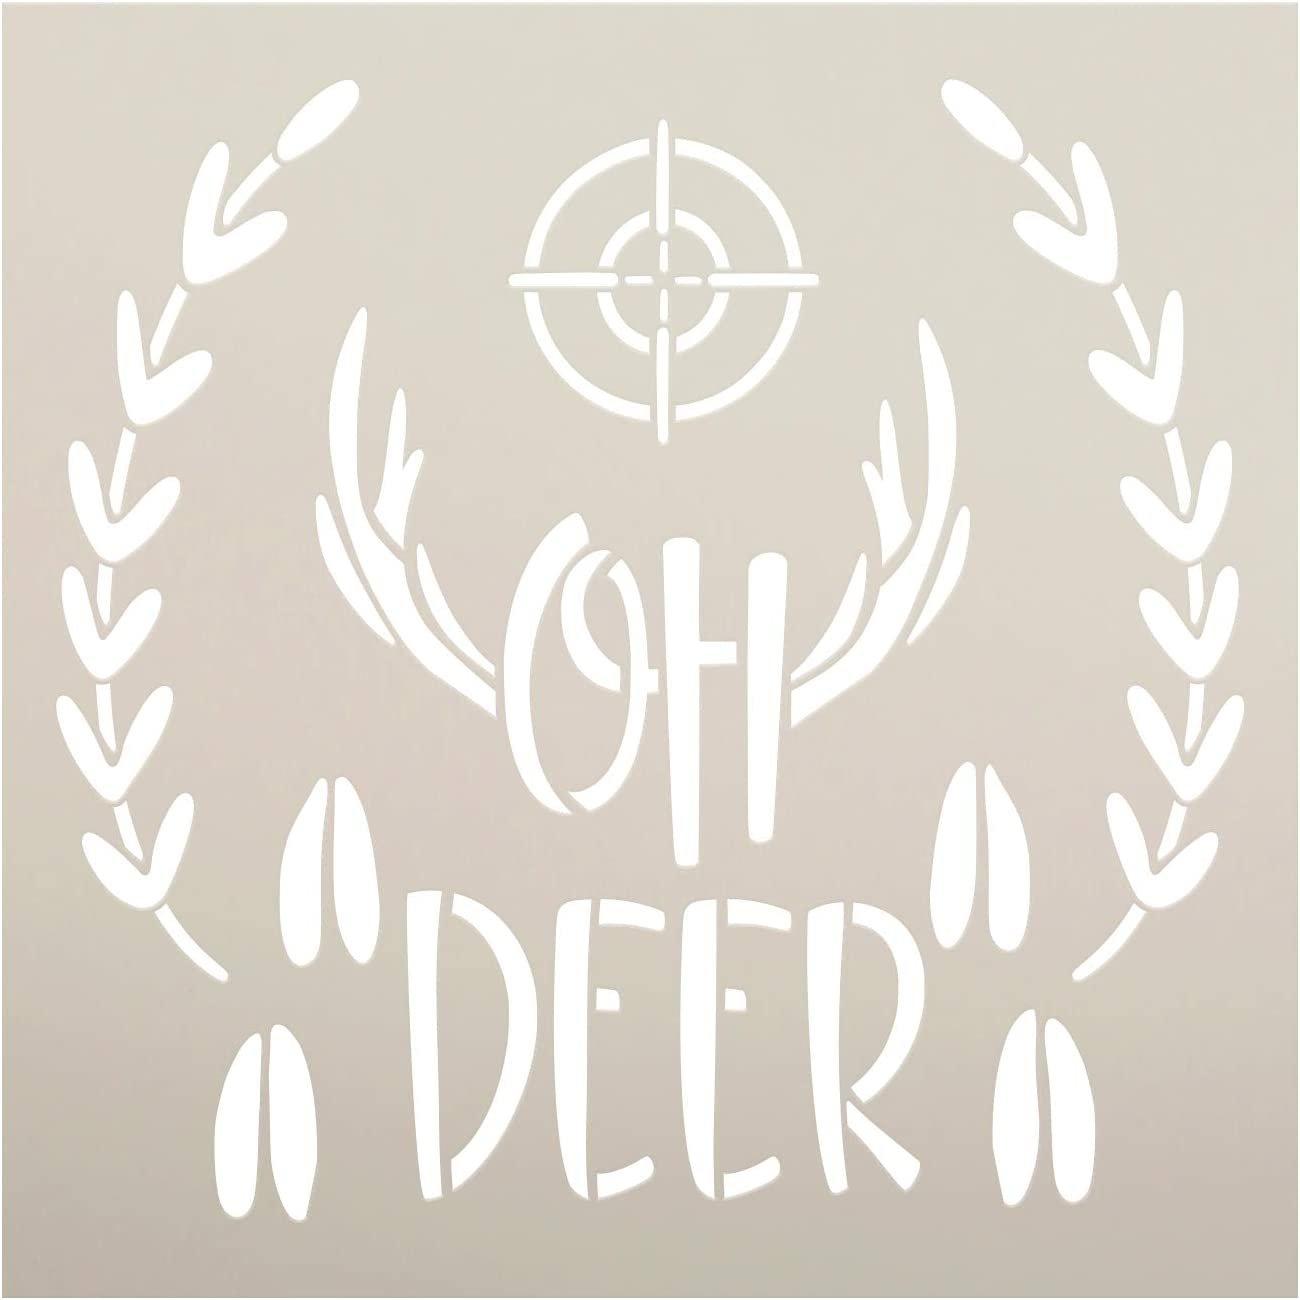 Oh Deer Stencil by StudioR12 | Scope - Antler - Tracks - Laurel | DIY Hunting Home Decor | Craft & Paint Wood Sign | Reusable Mylar Template | Select Size